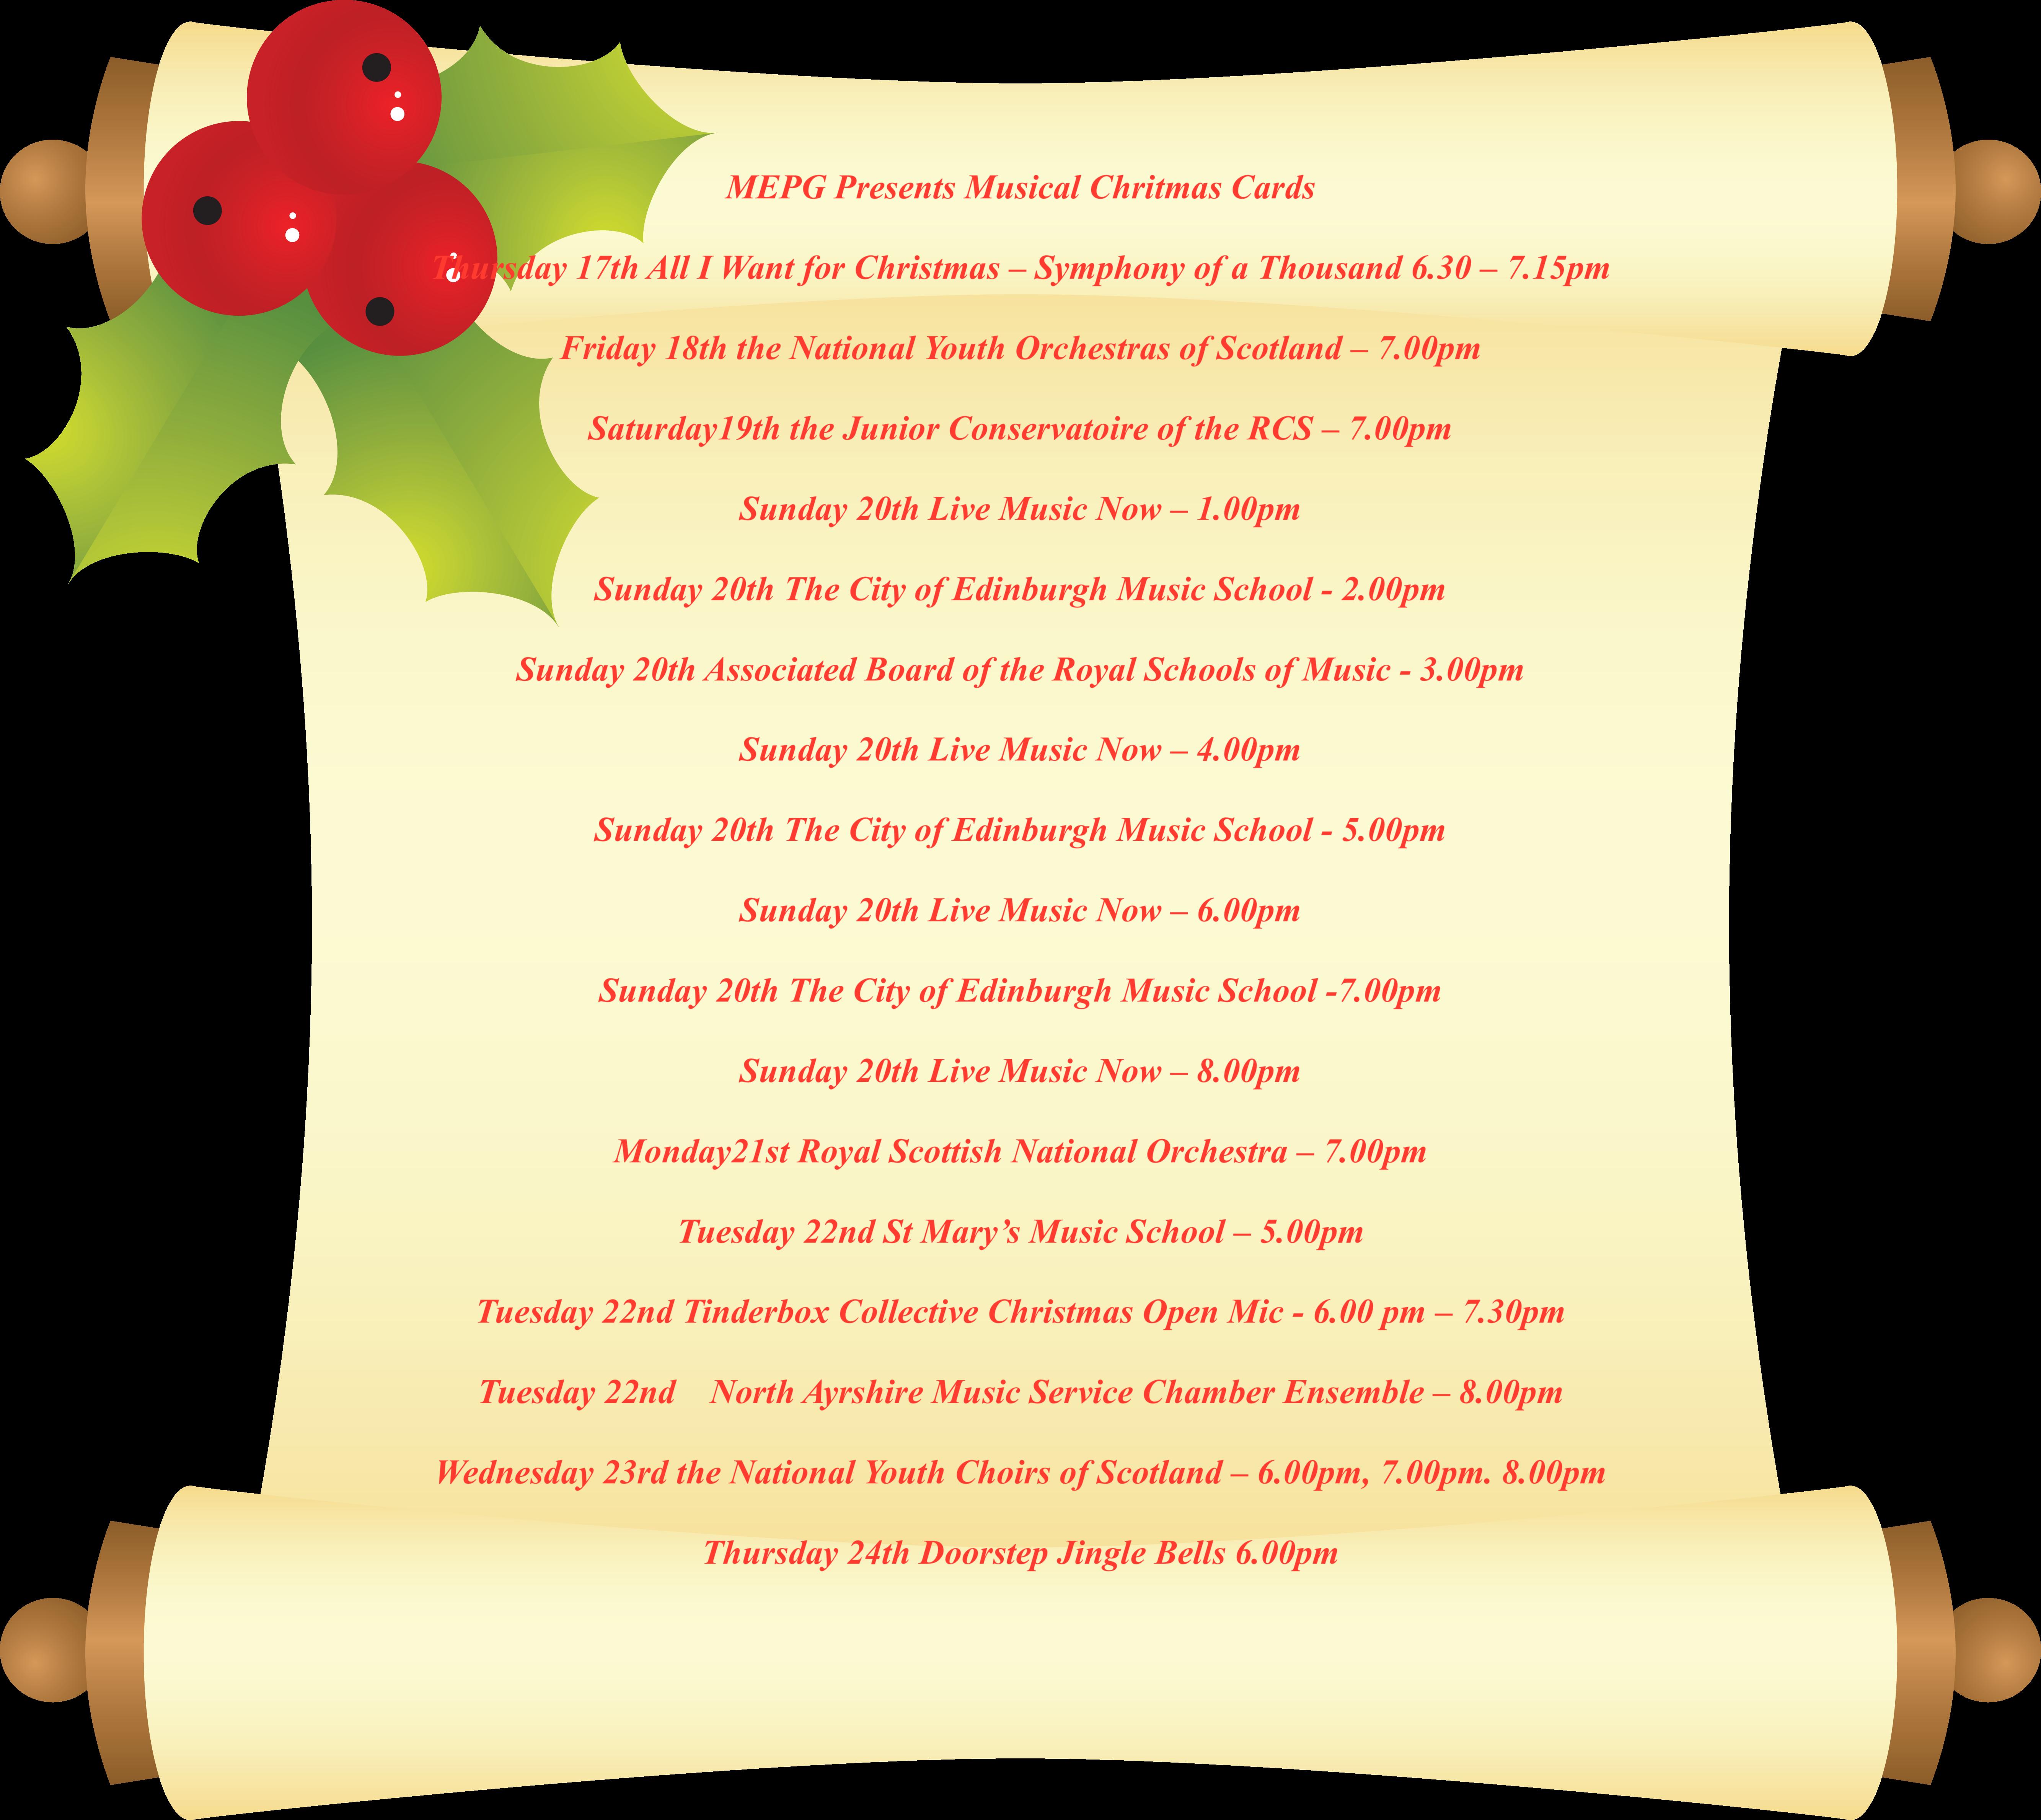 Musical Christmas Cards Festival